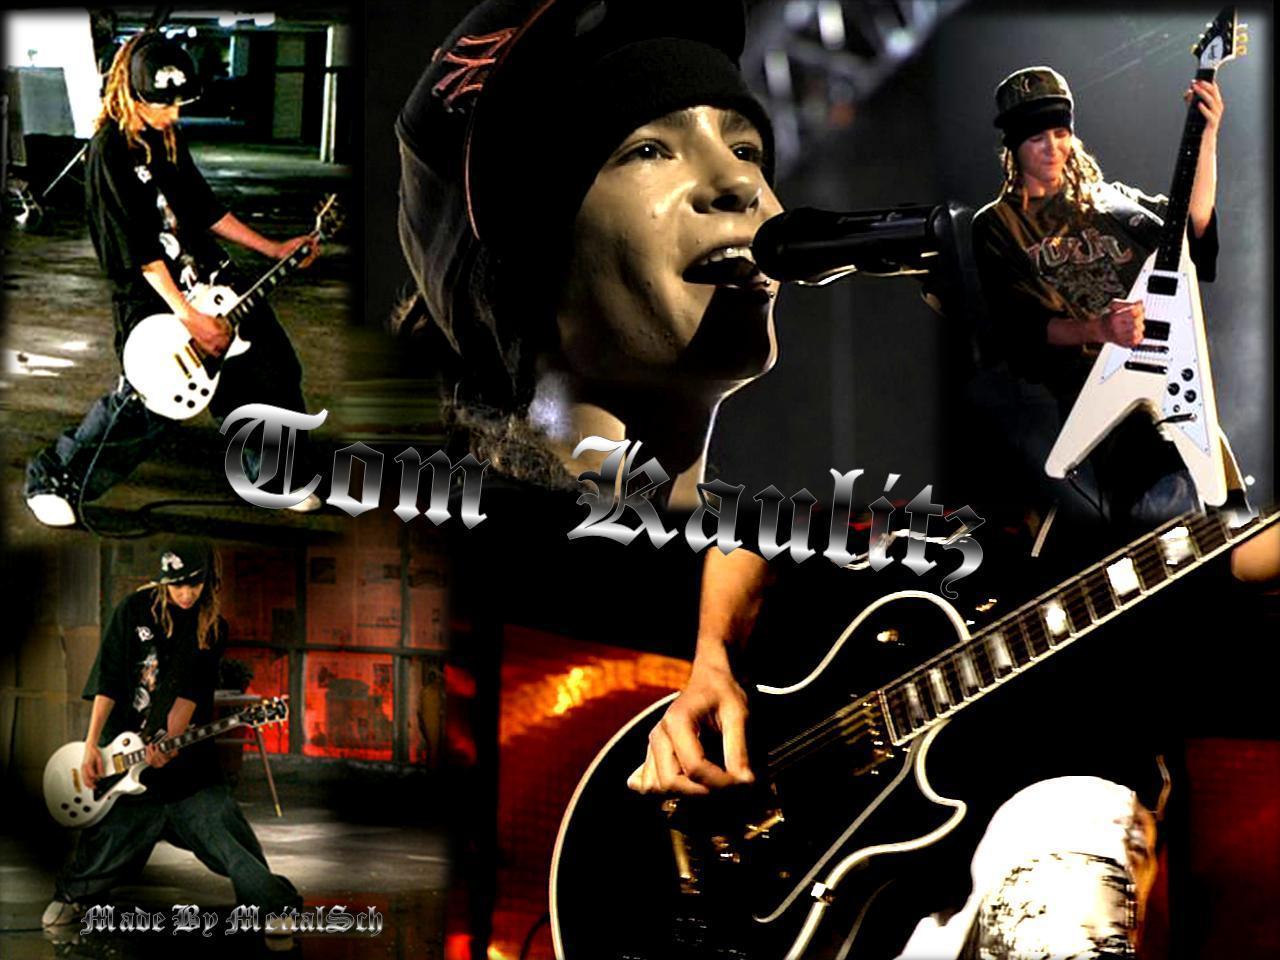 Tom Wallpaper - Tokio Hotel 1280x960 1024x768 800x600